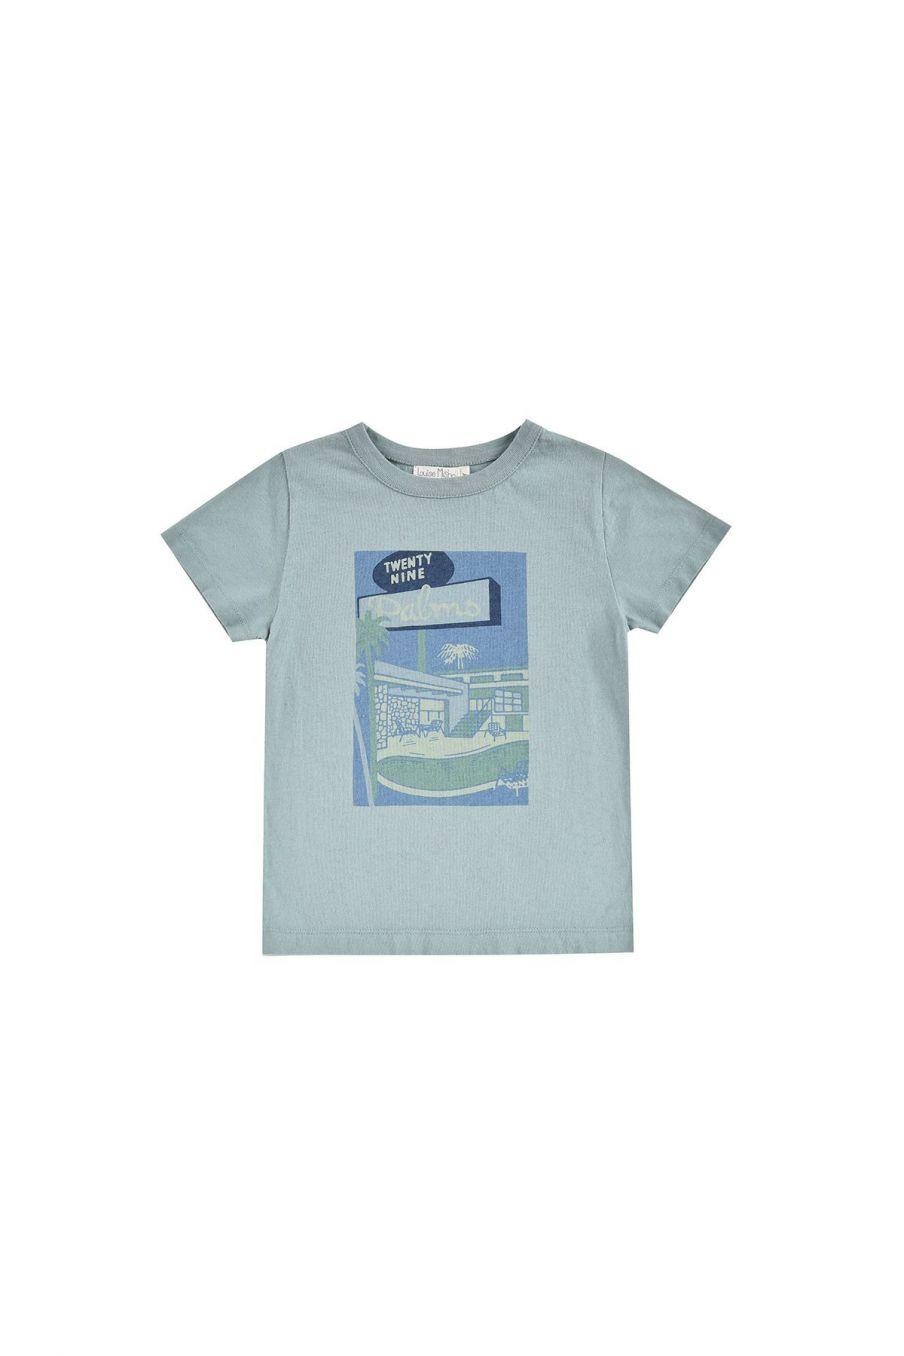 boheme chic vintage t-shirt garcon atayo vintage blue